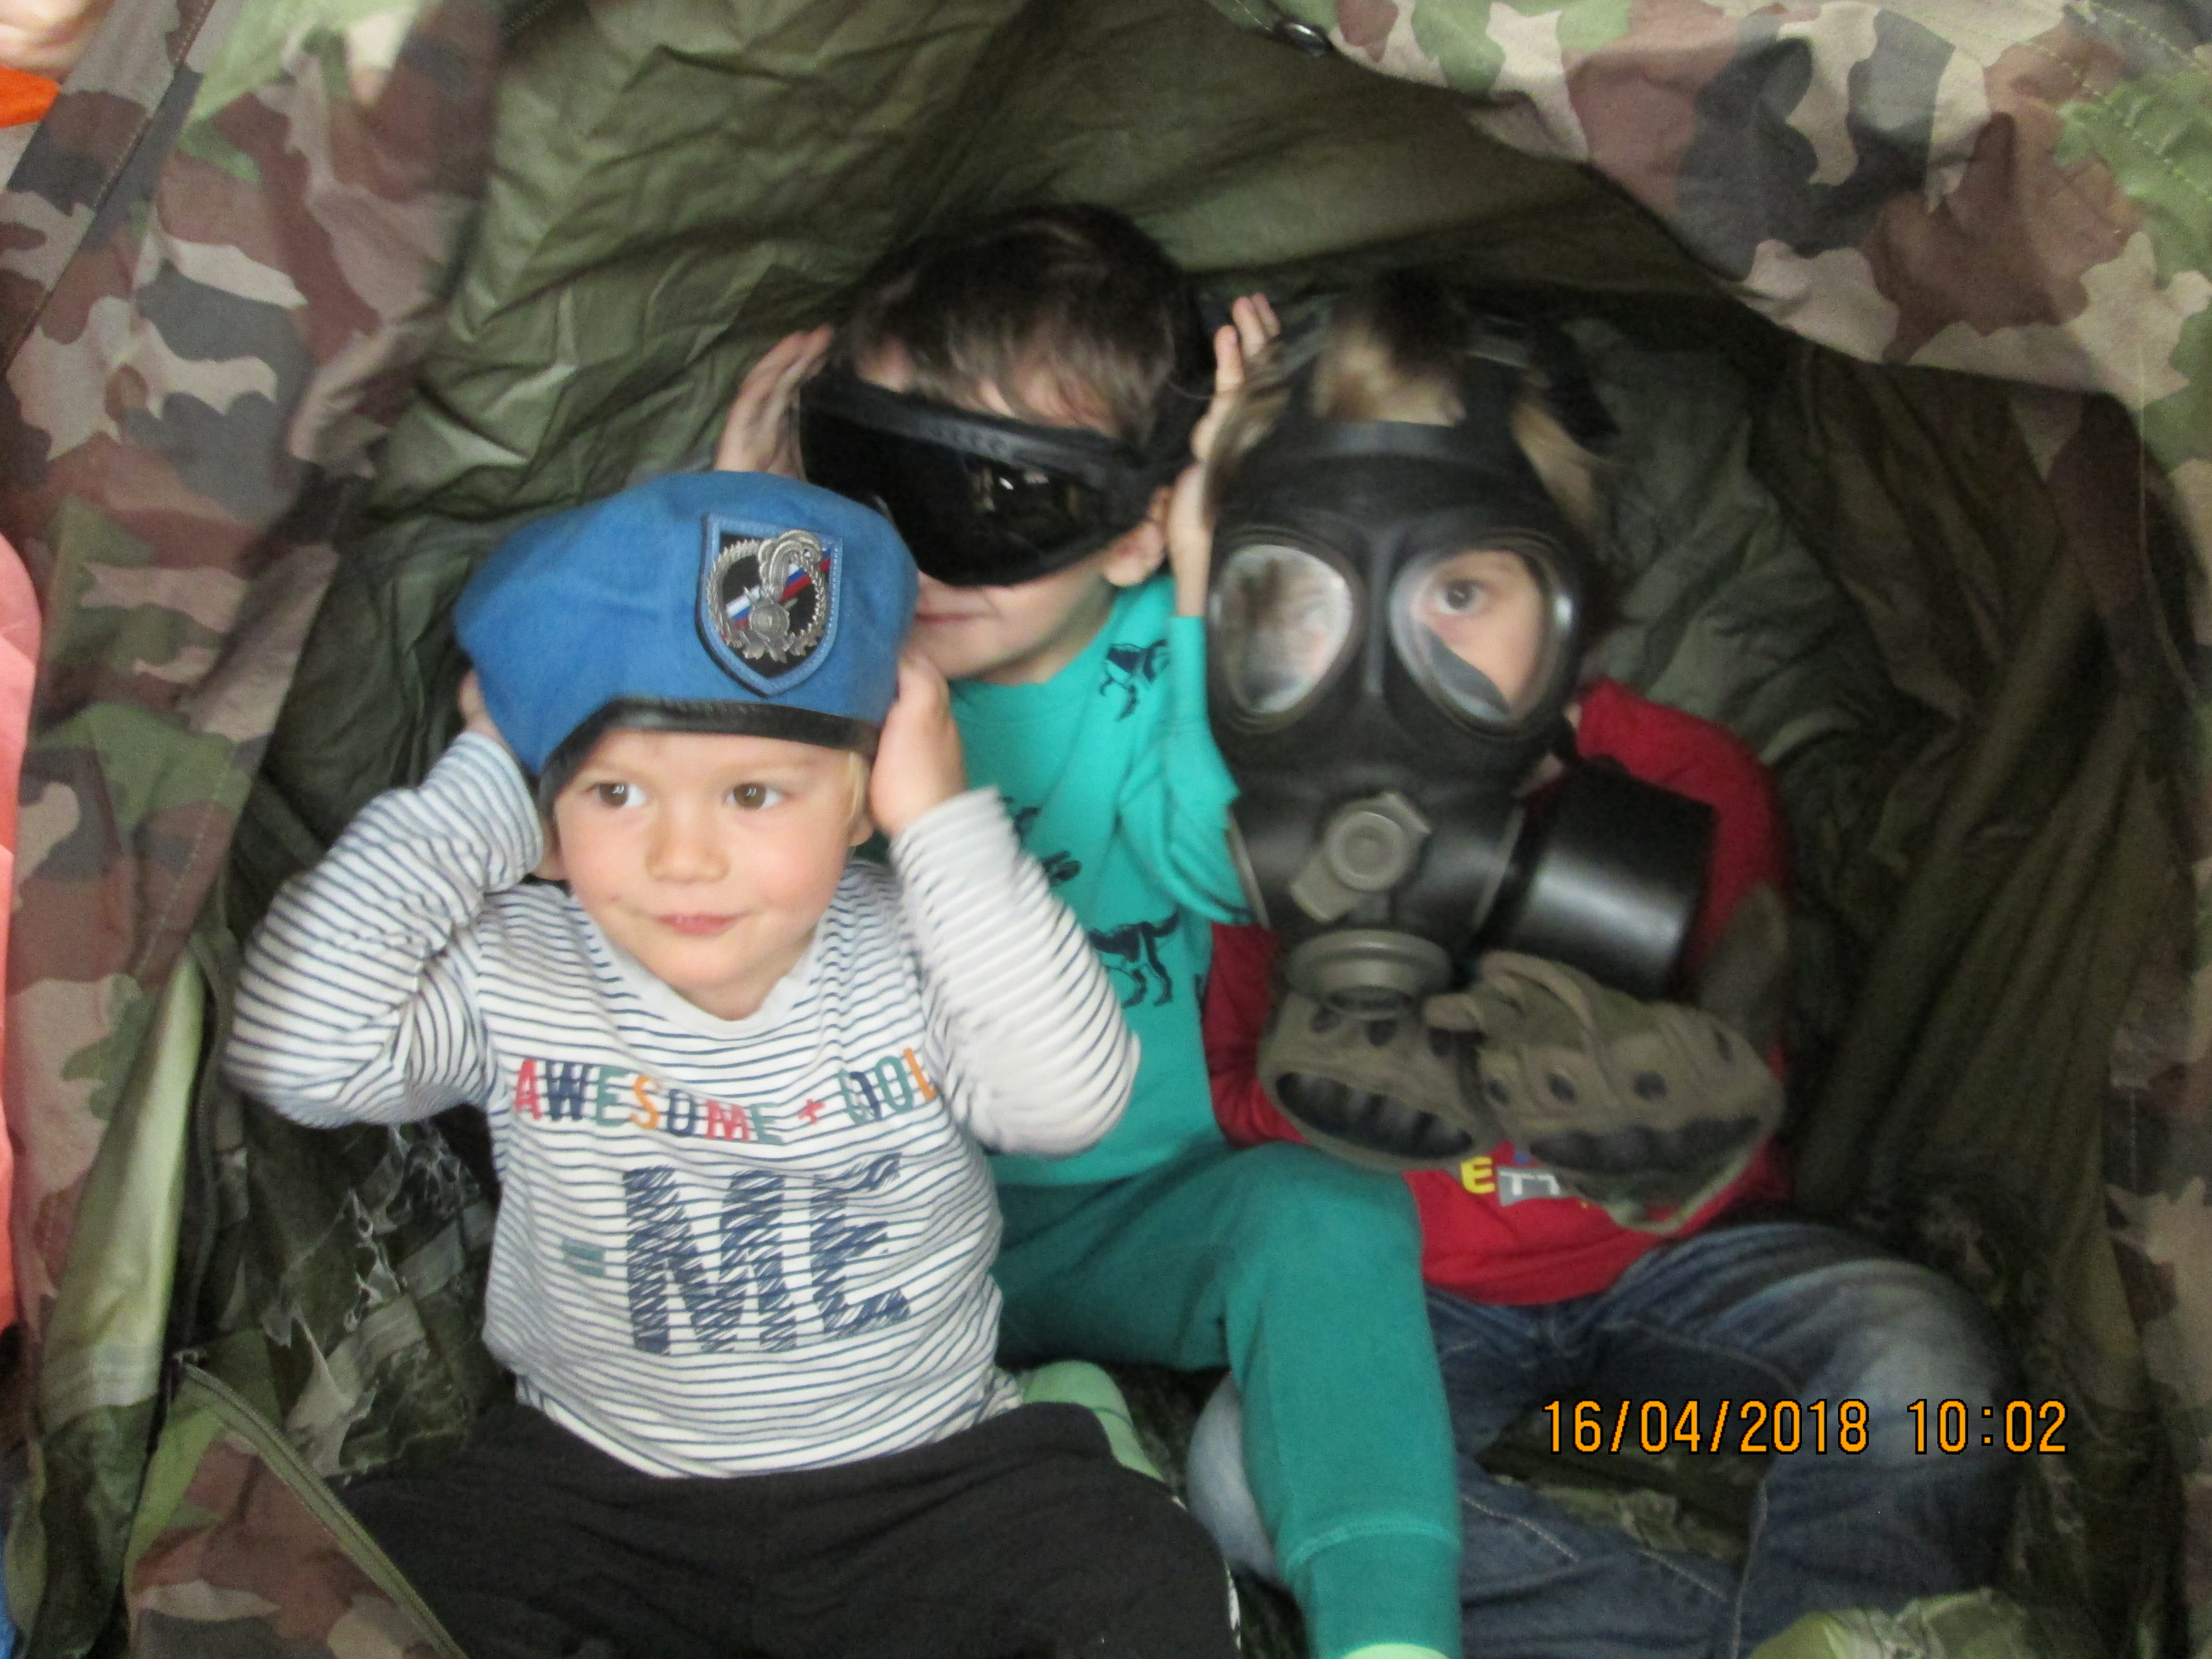 vojak-na-obisku-25